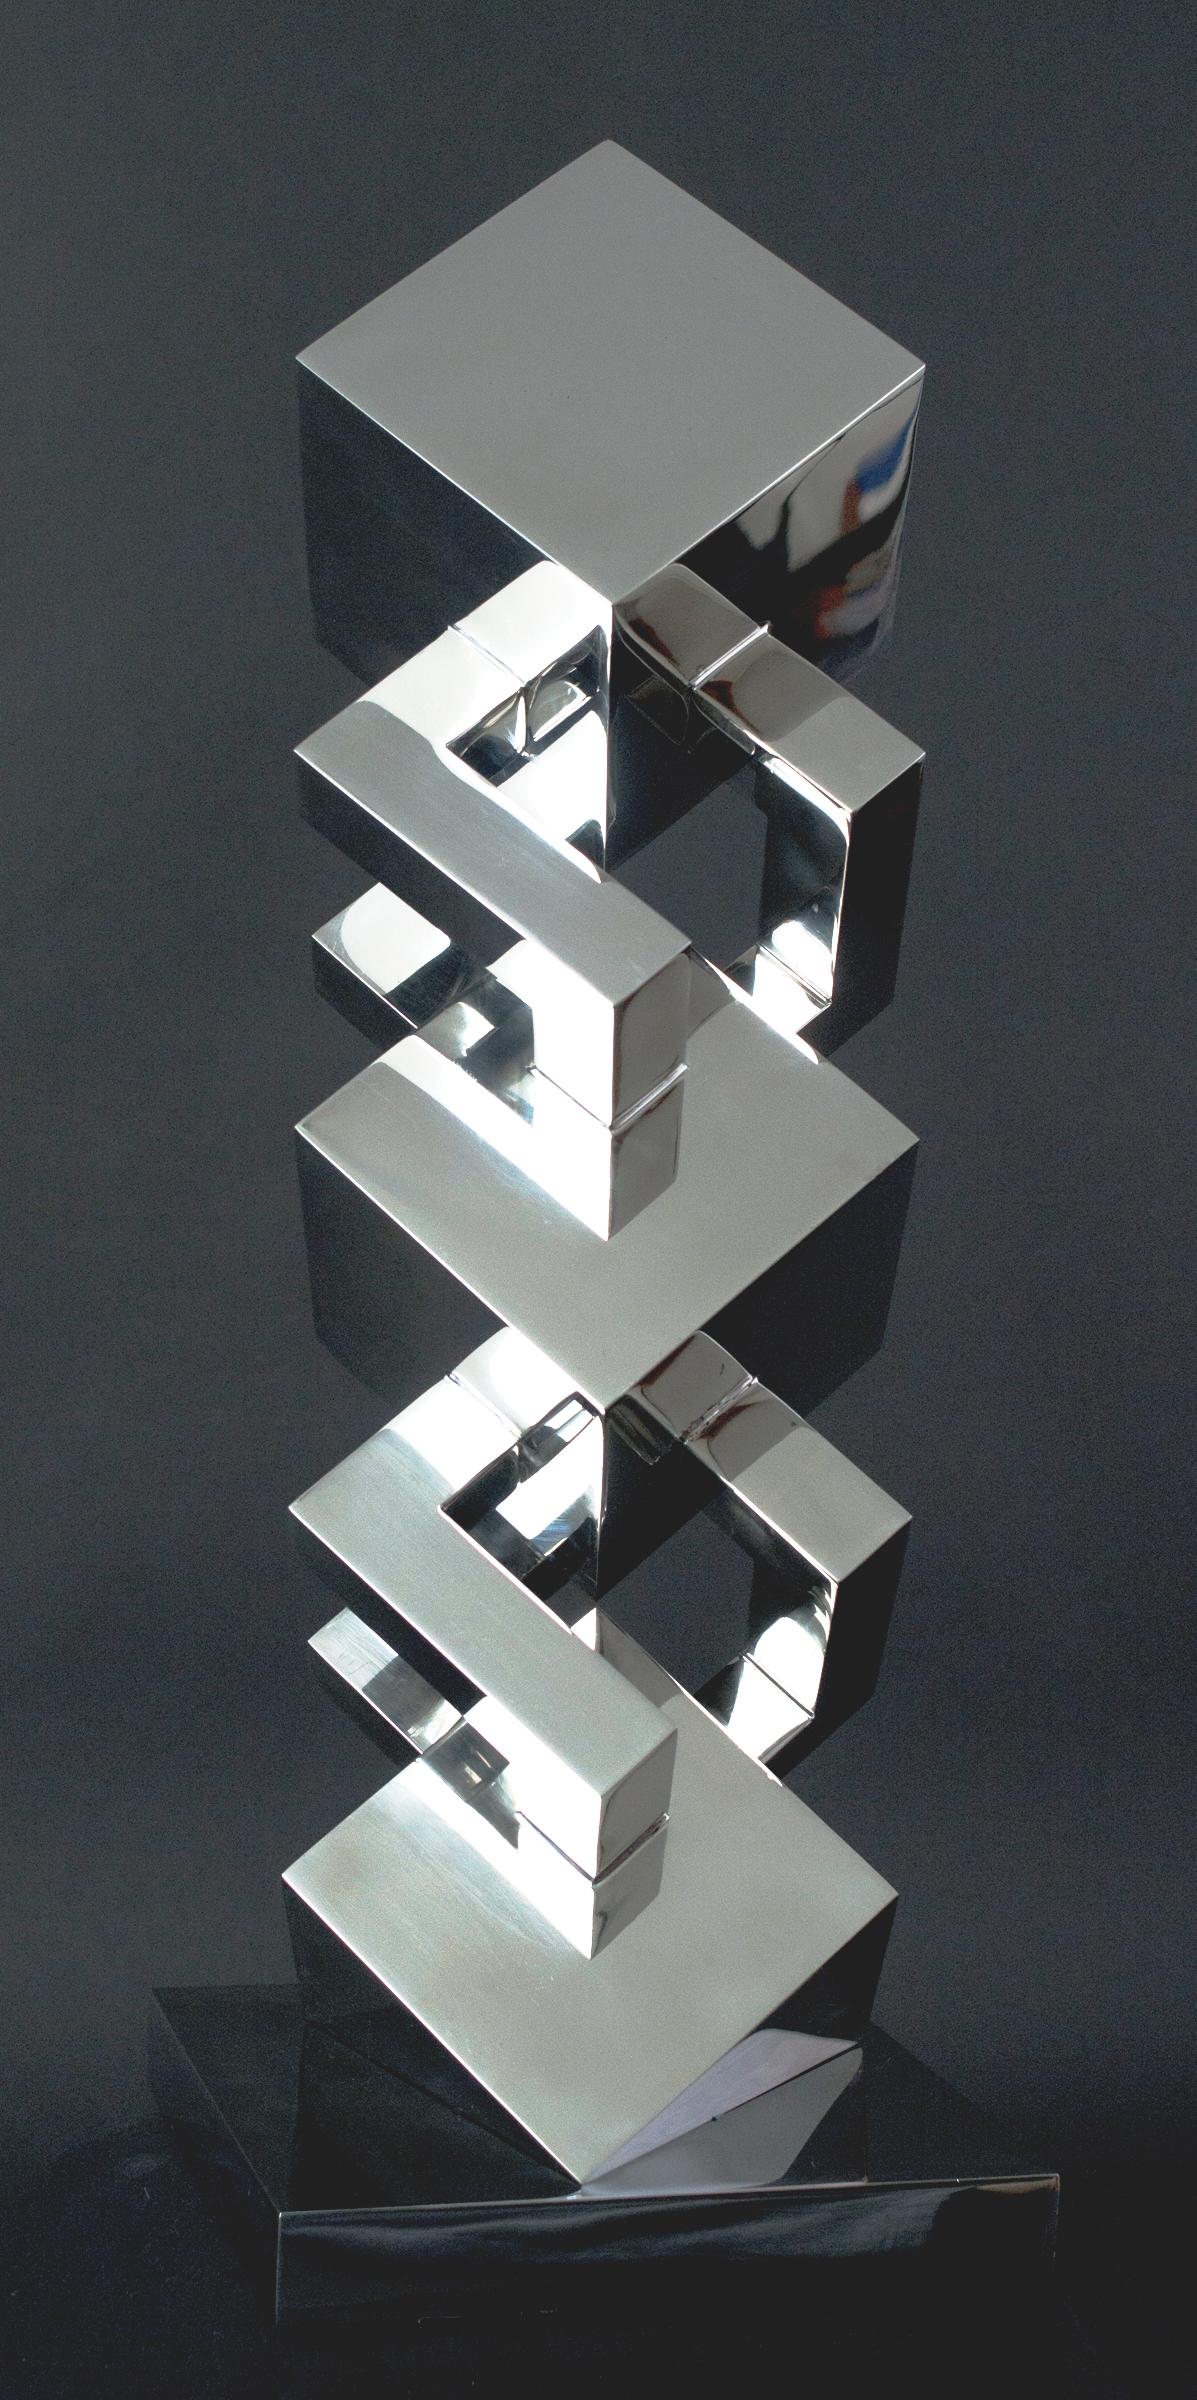 Cubexistentialism.jpg